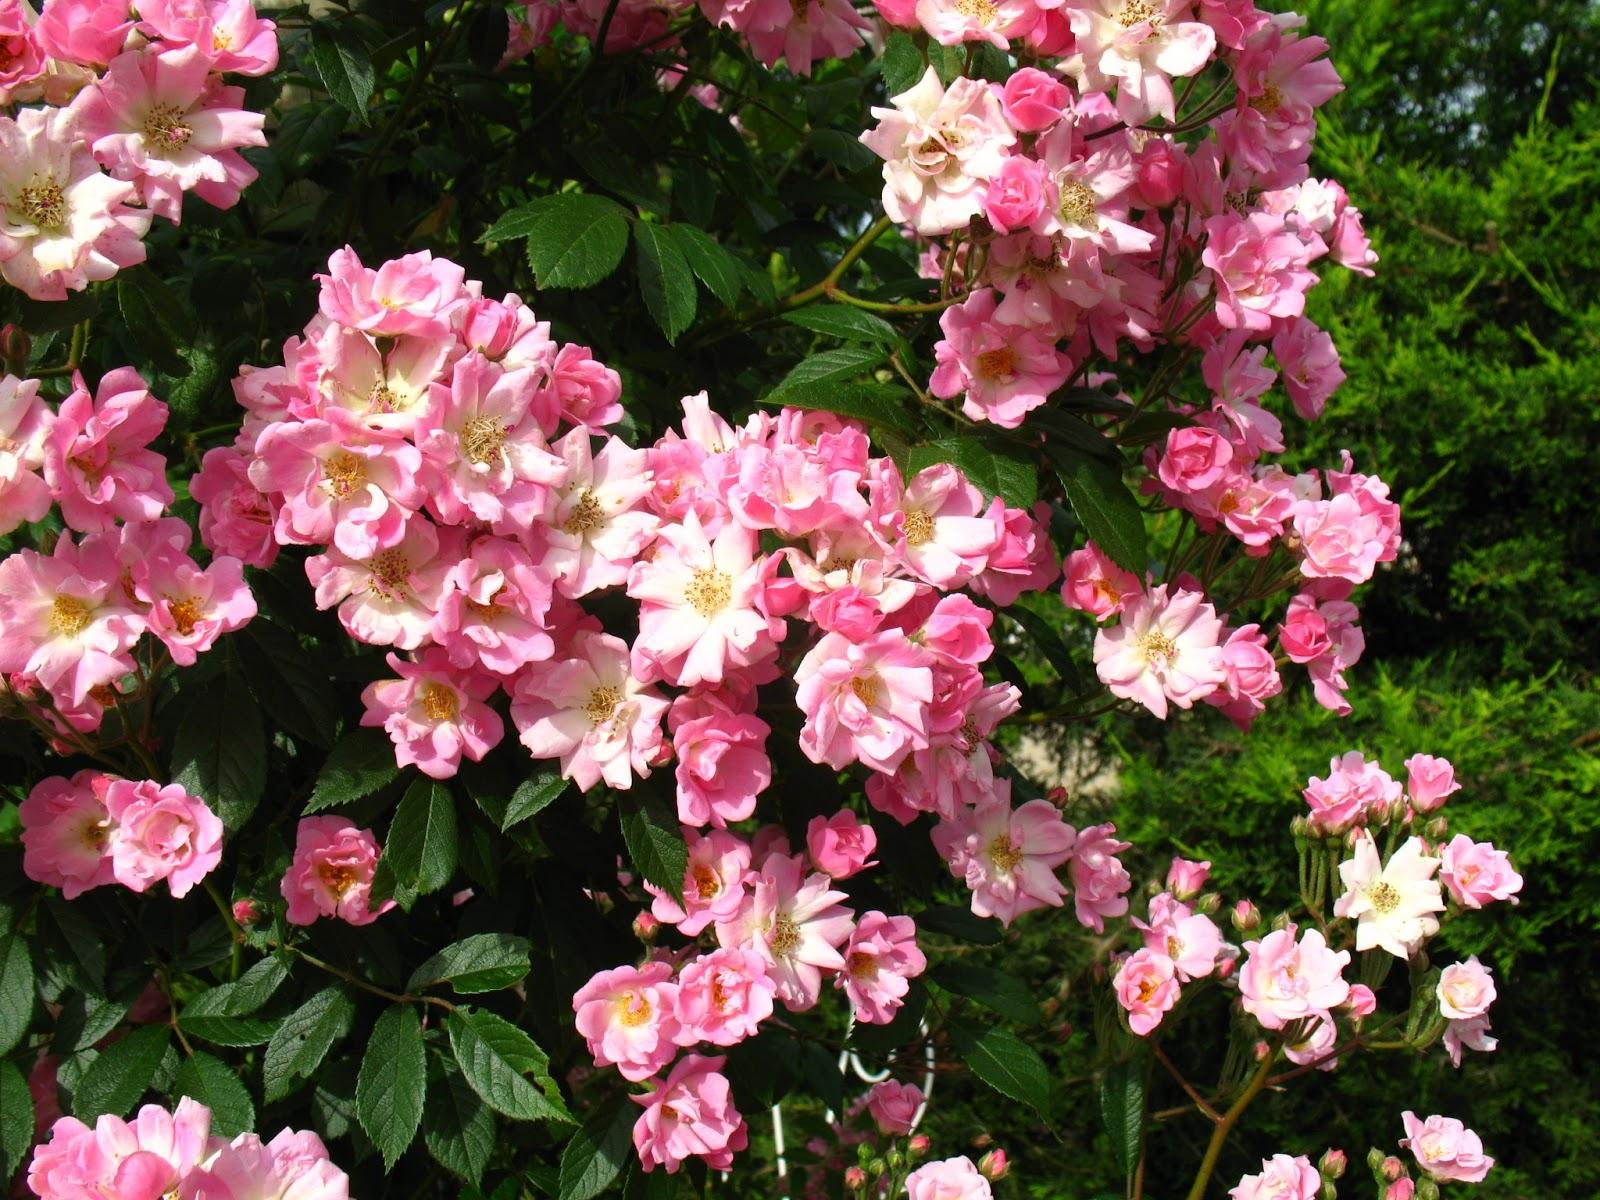 Roses du jardin ch neland rosier marietta silva tarouca - Quand bouturer les rosiers ...